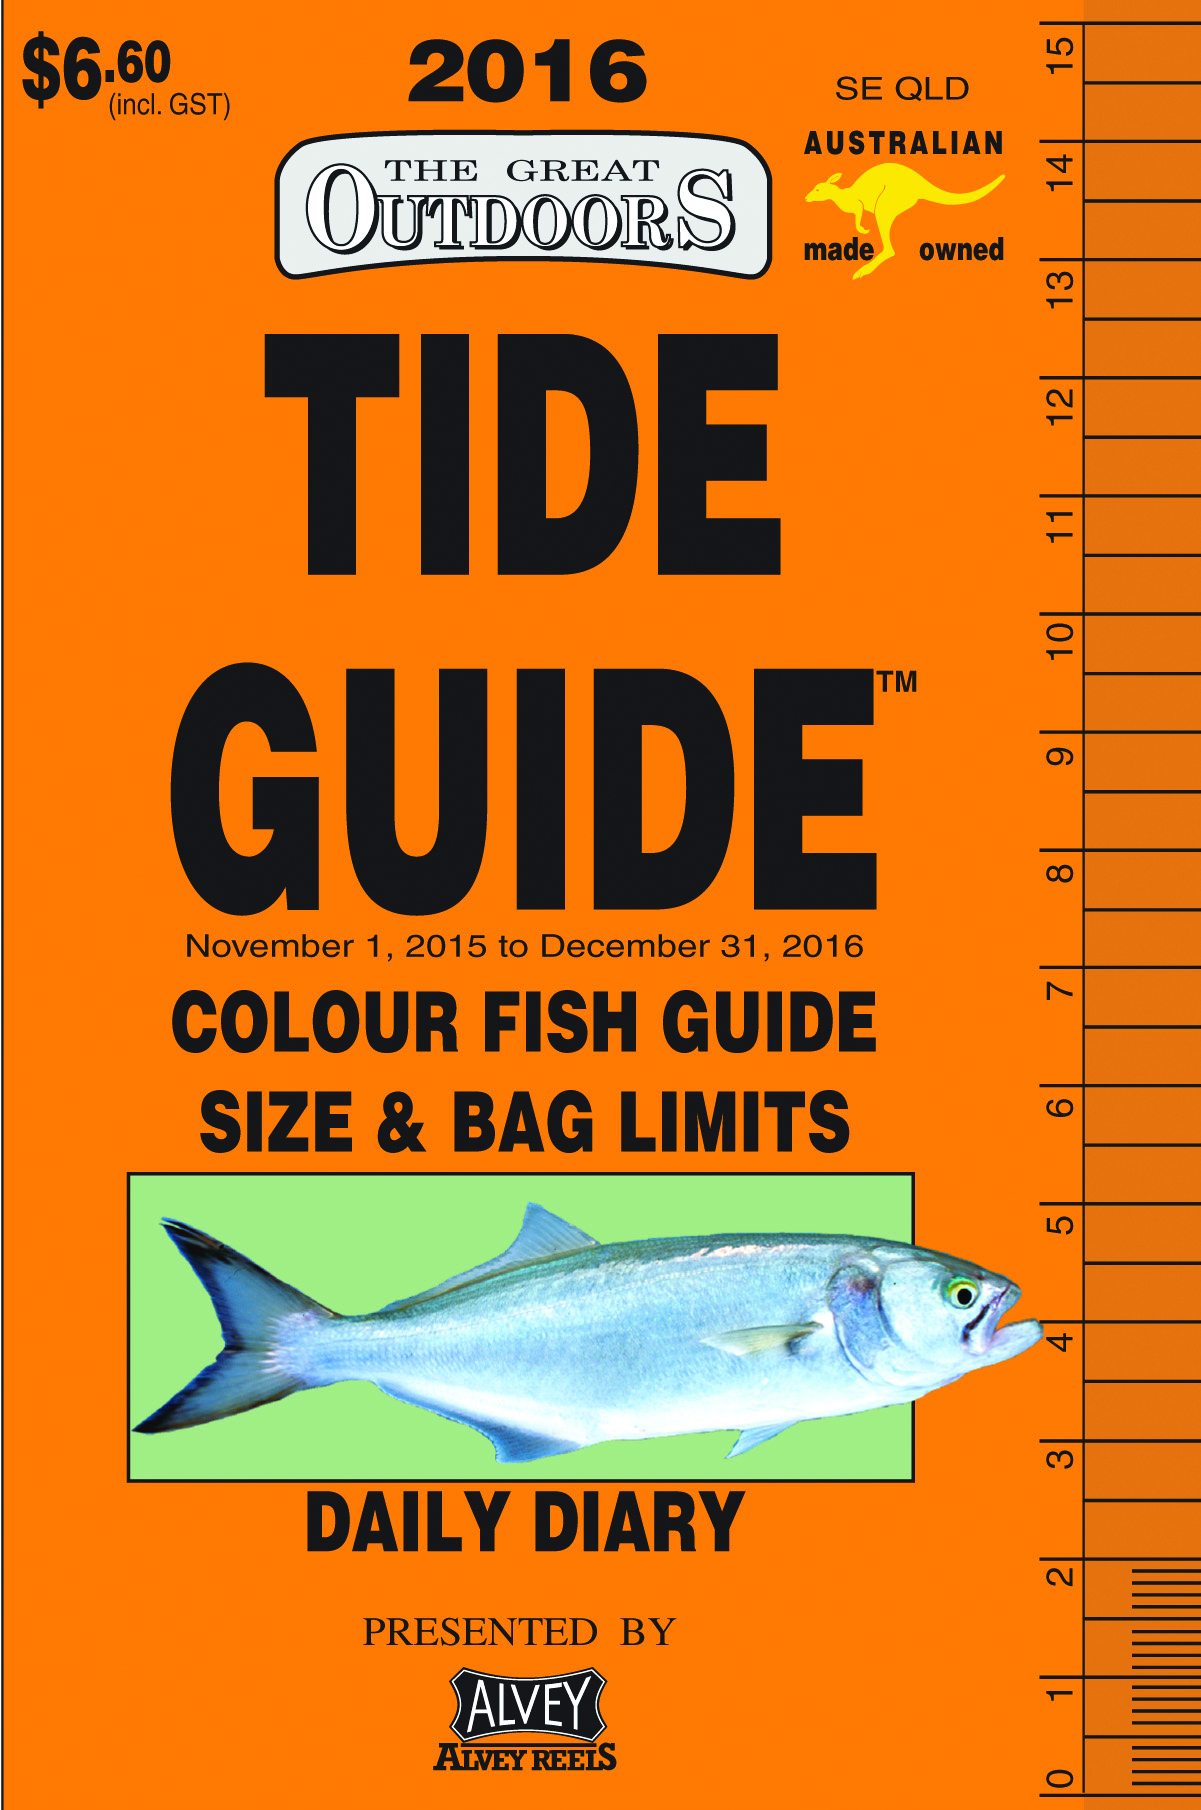 The little orange Tide Guide is back 2016